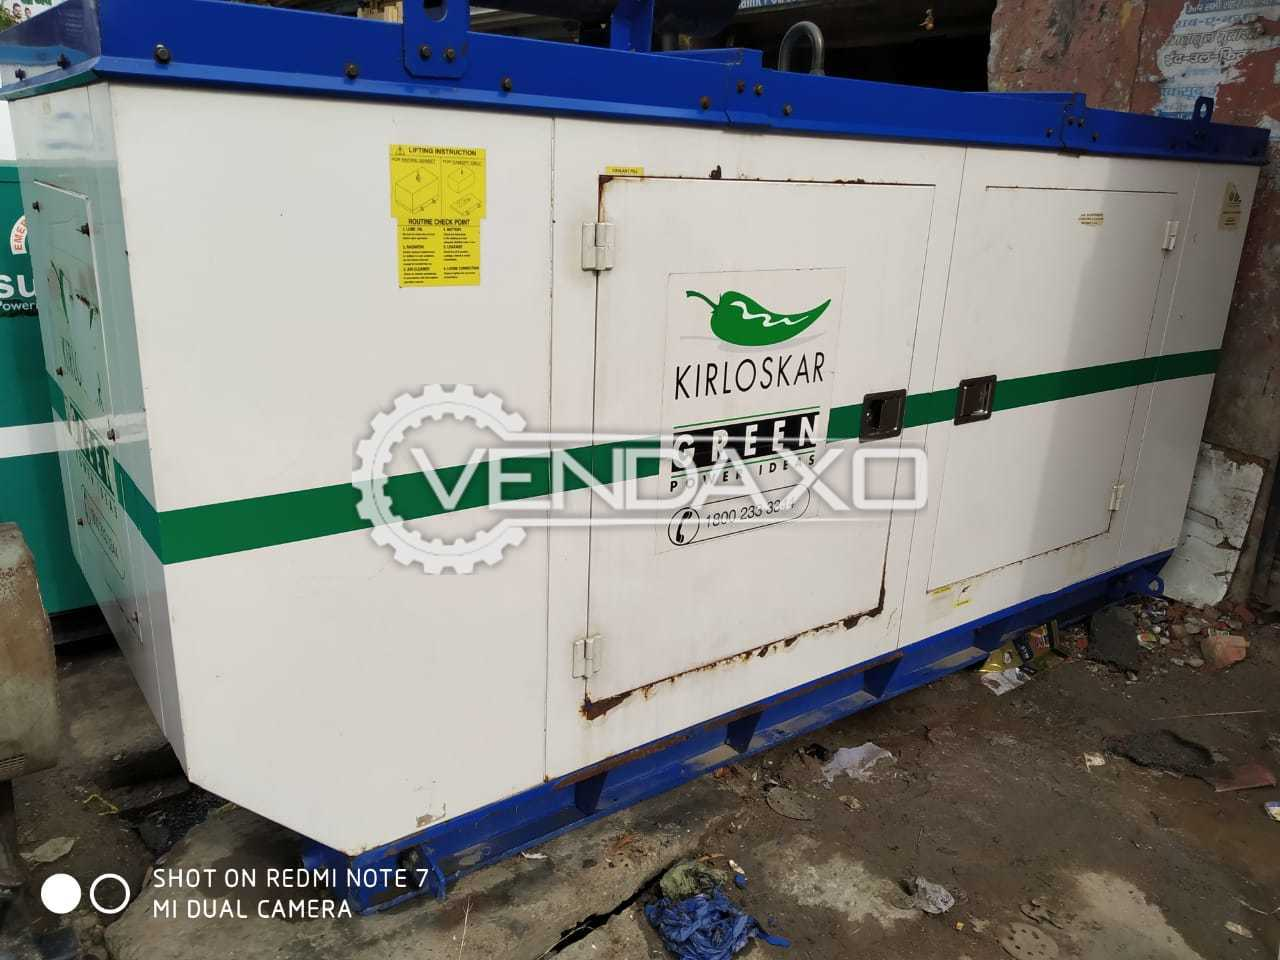 Kirloskar Diesel Generator - 70 kVA, 2009 Model